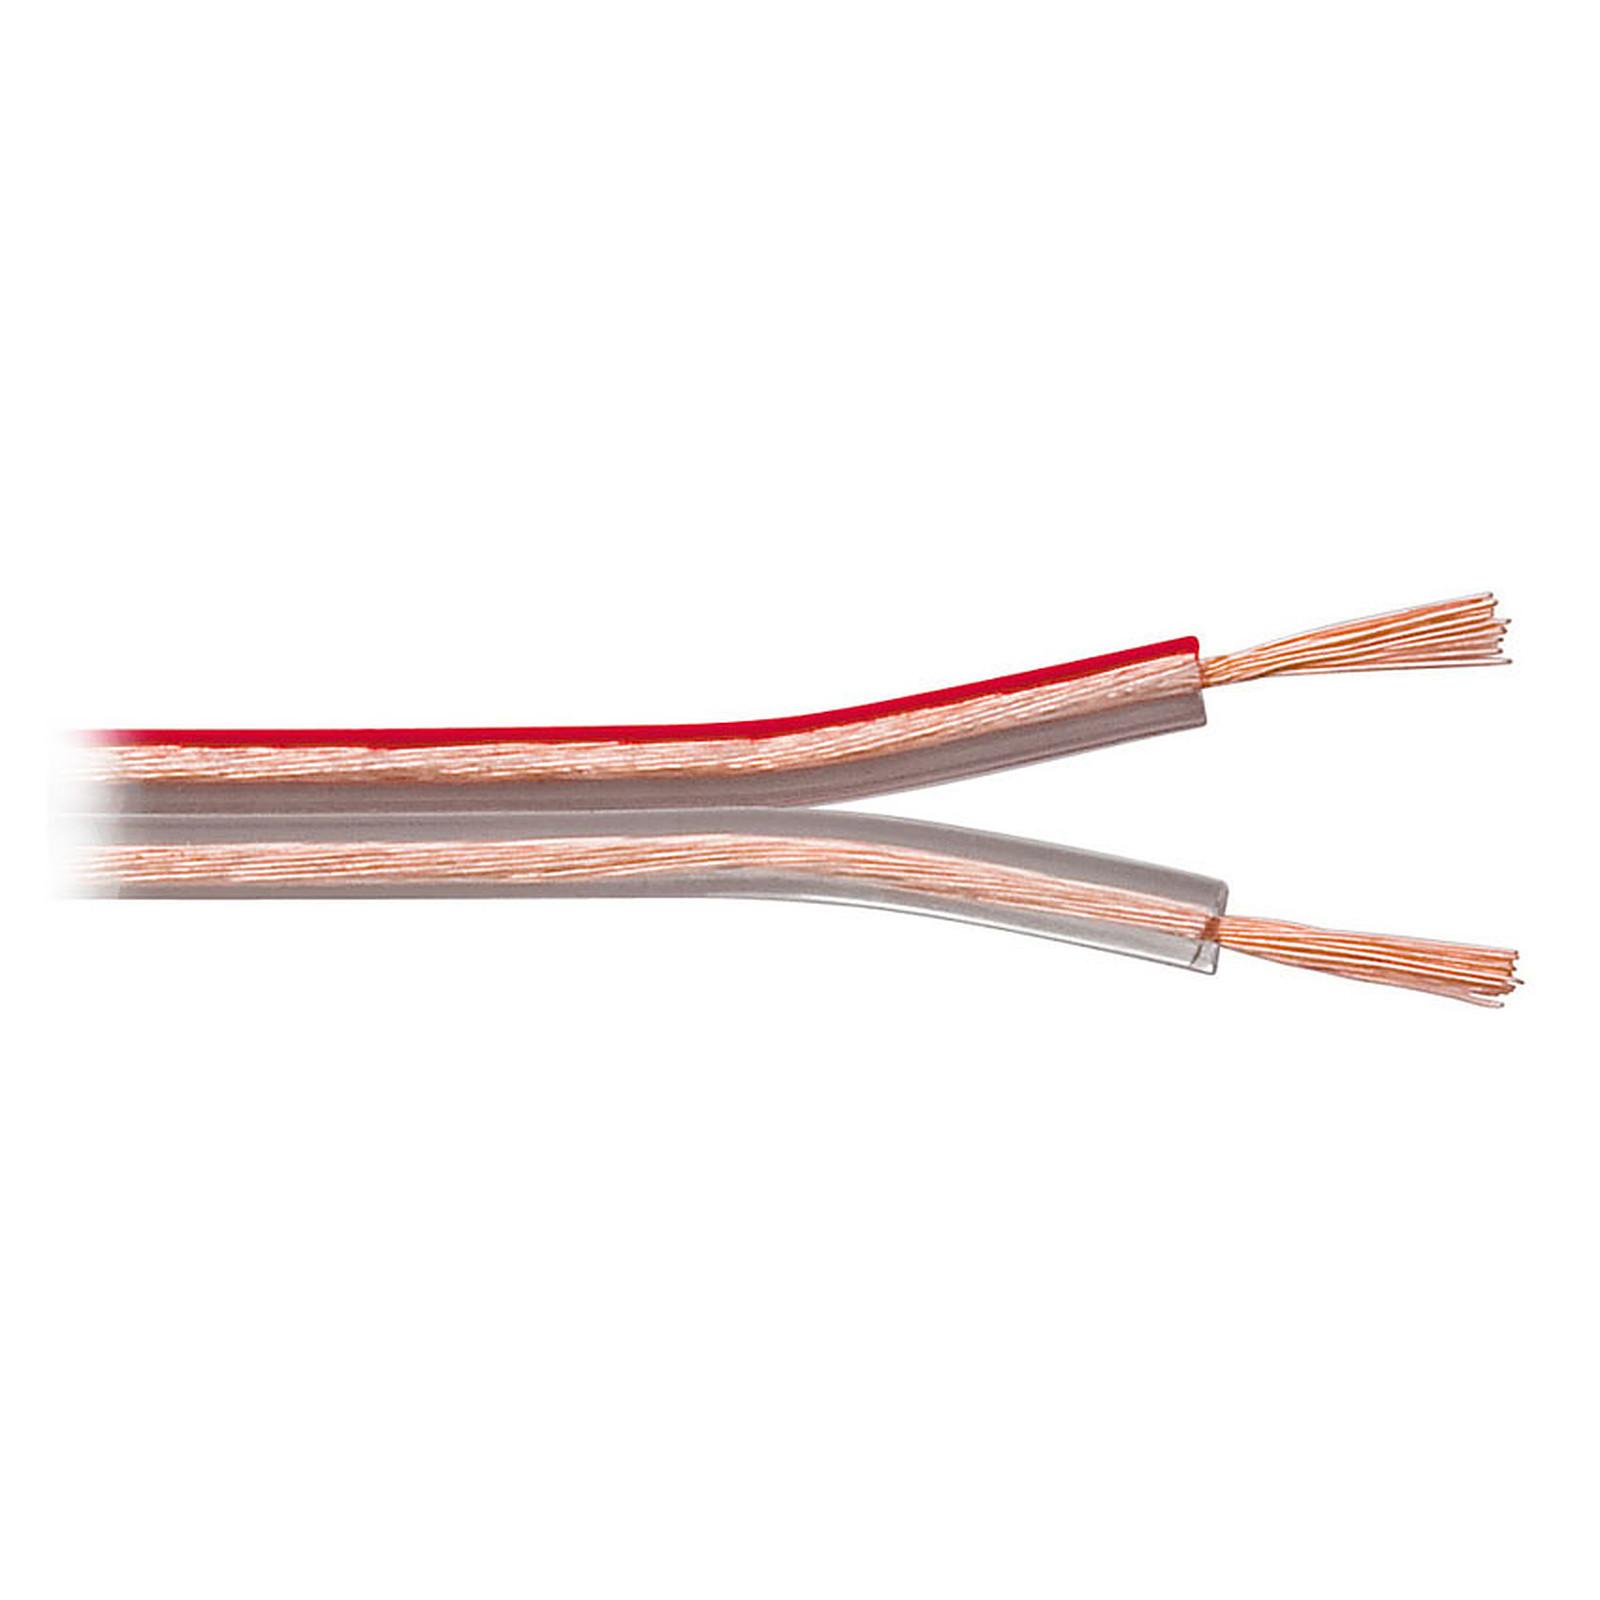 Cable de altavoz 1,5 mm² de cobre OFC - rollo de 10 metros